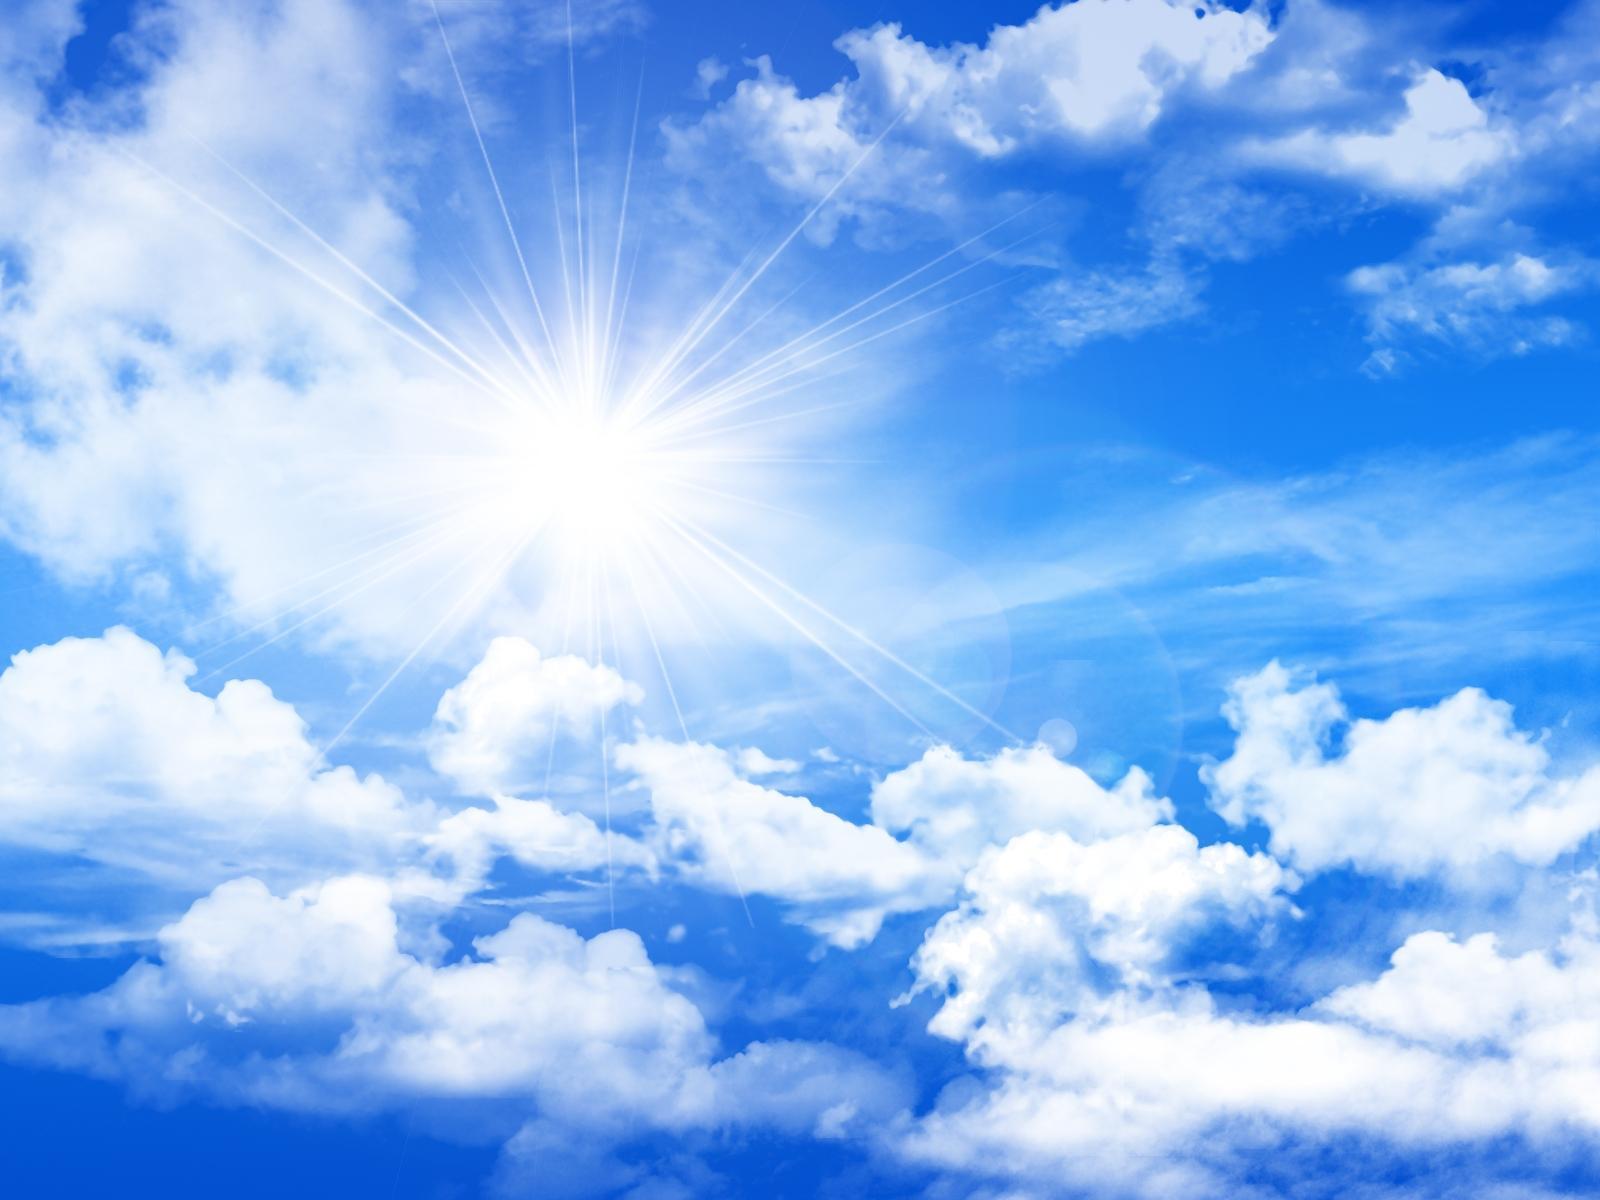 Четыре факта о небе: